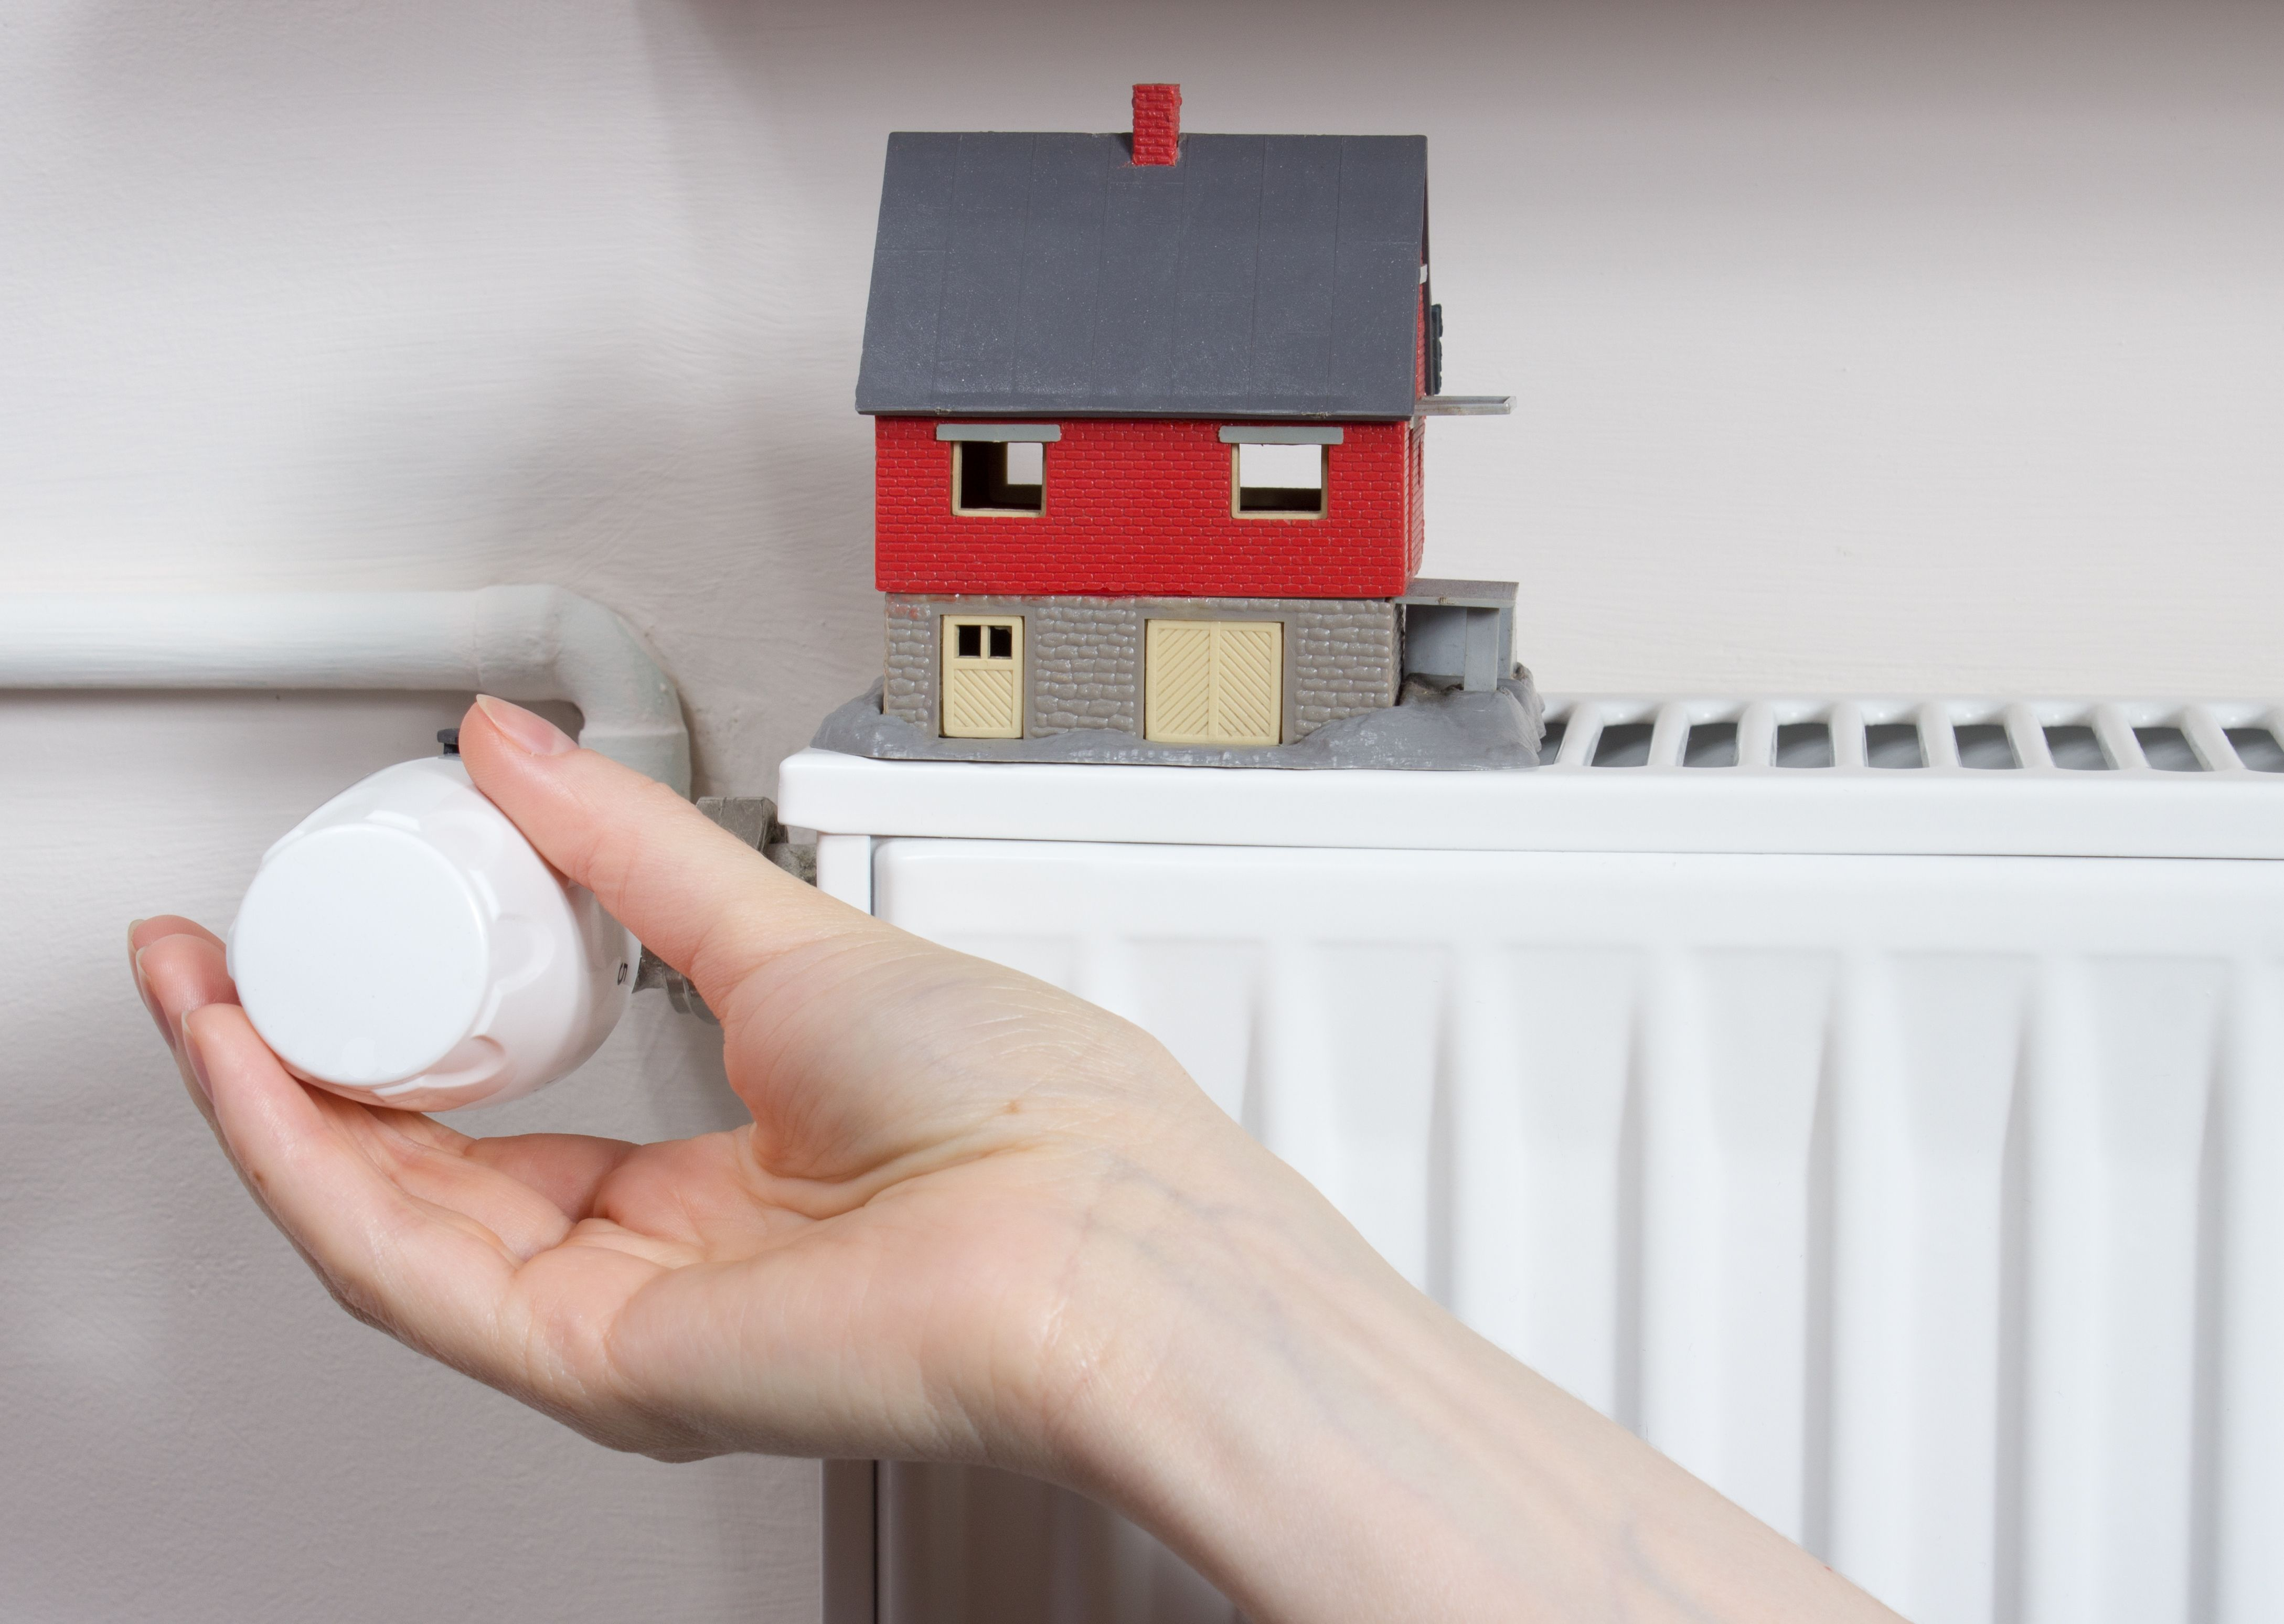 Instalación de calefacción: Servicios de ACC Climatización, S.L. - Centro Colaborador de Gas Natural Servicios